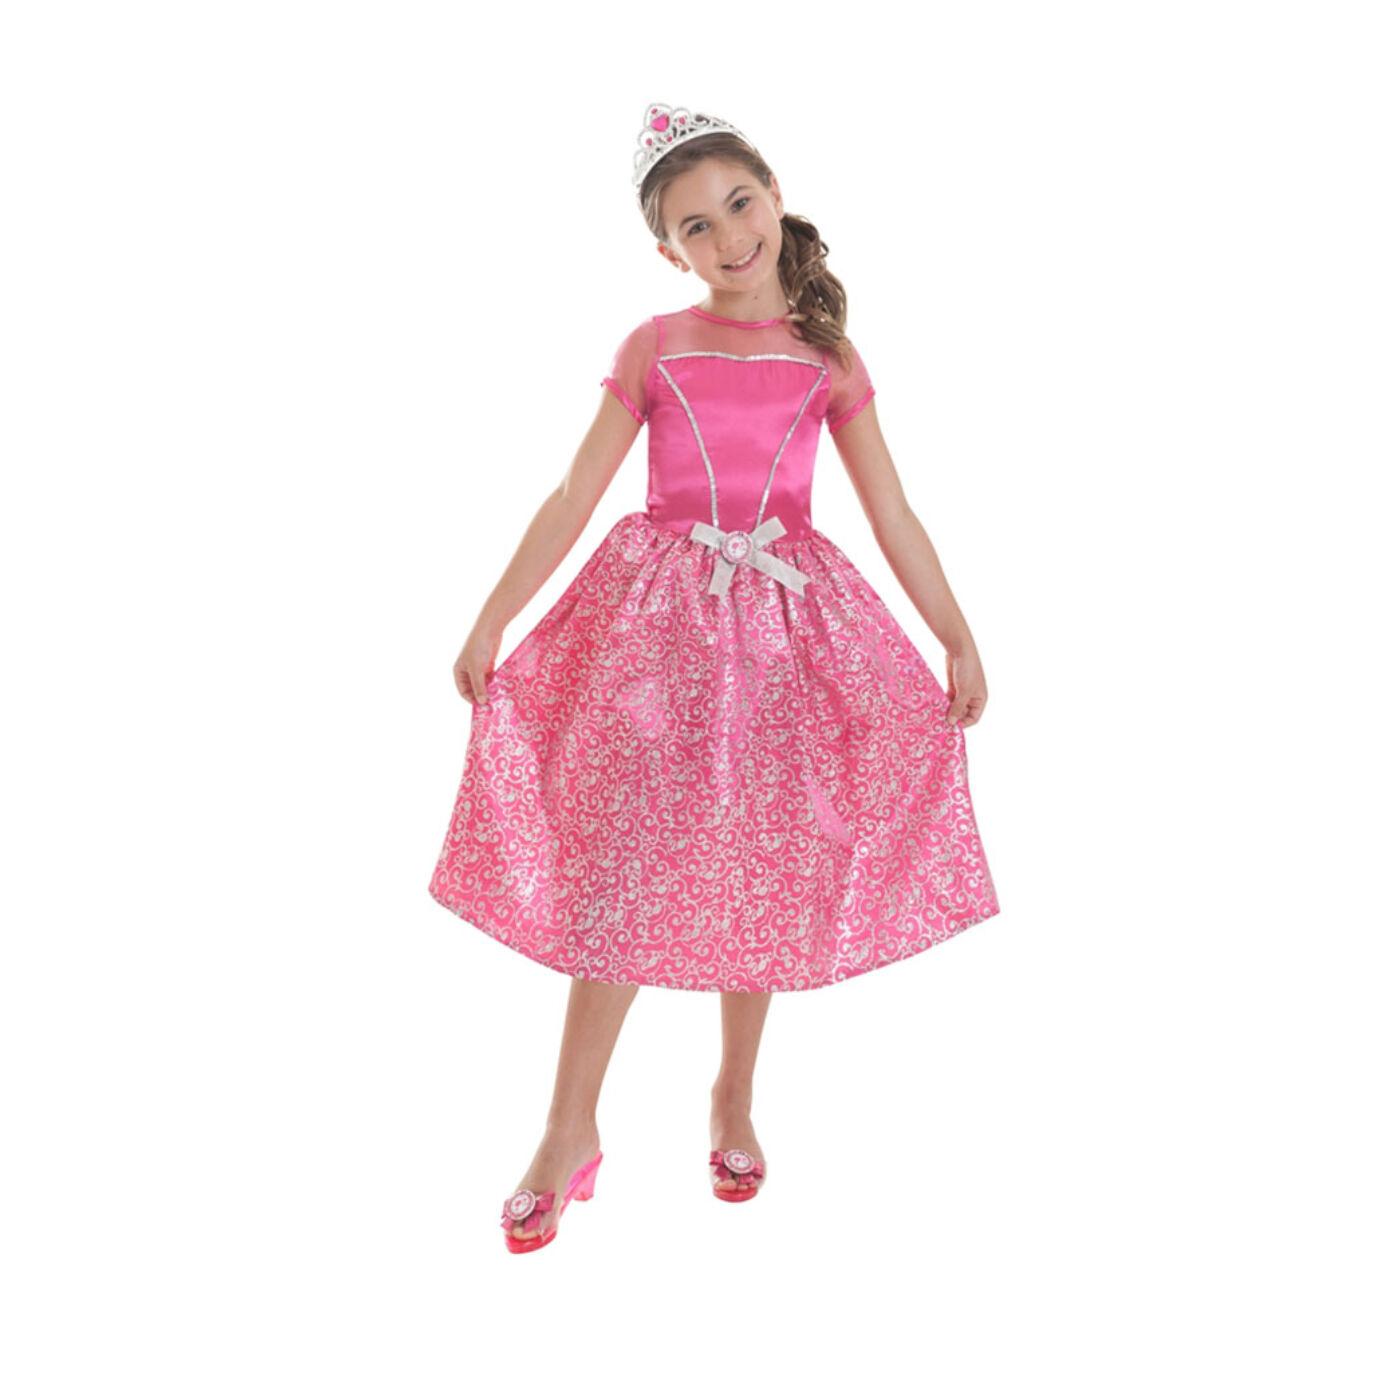 Barbie hercegnő jelmez